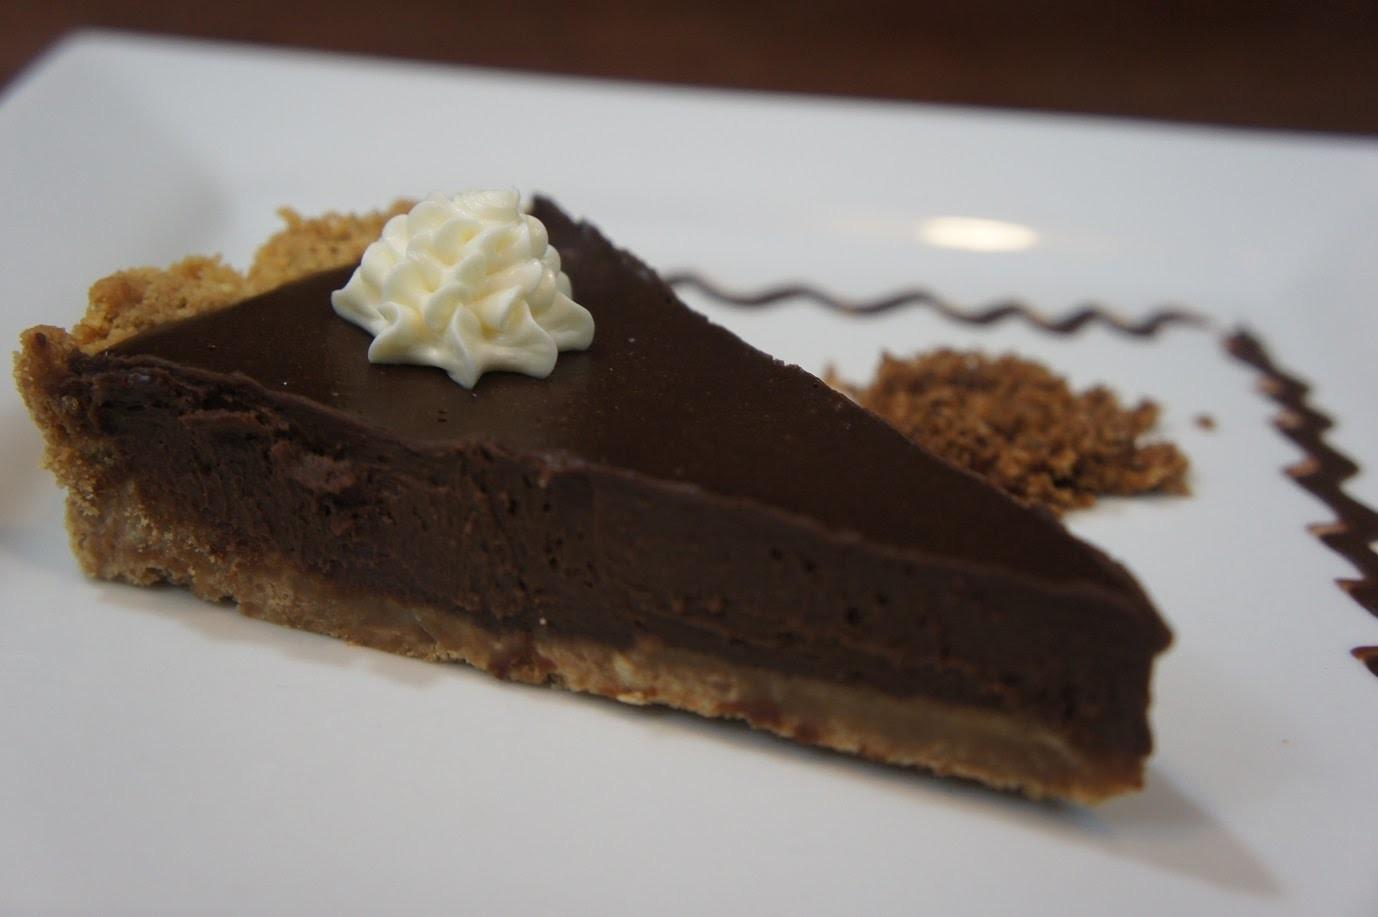 TARTA DE CHOCOLATE - BAKING DAY